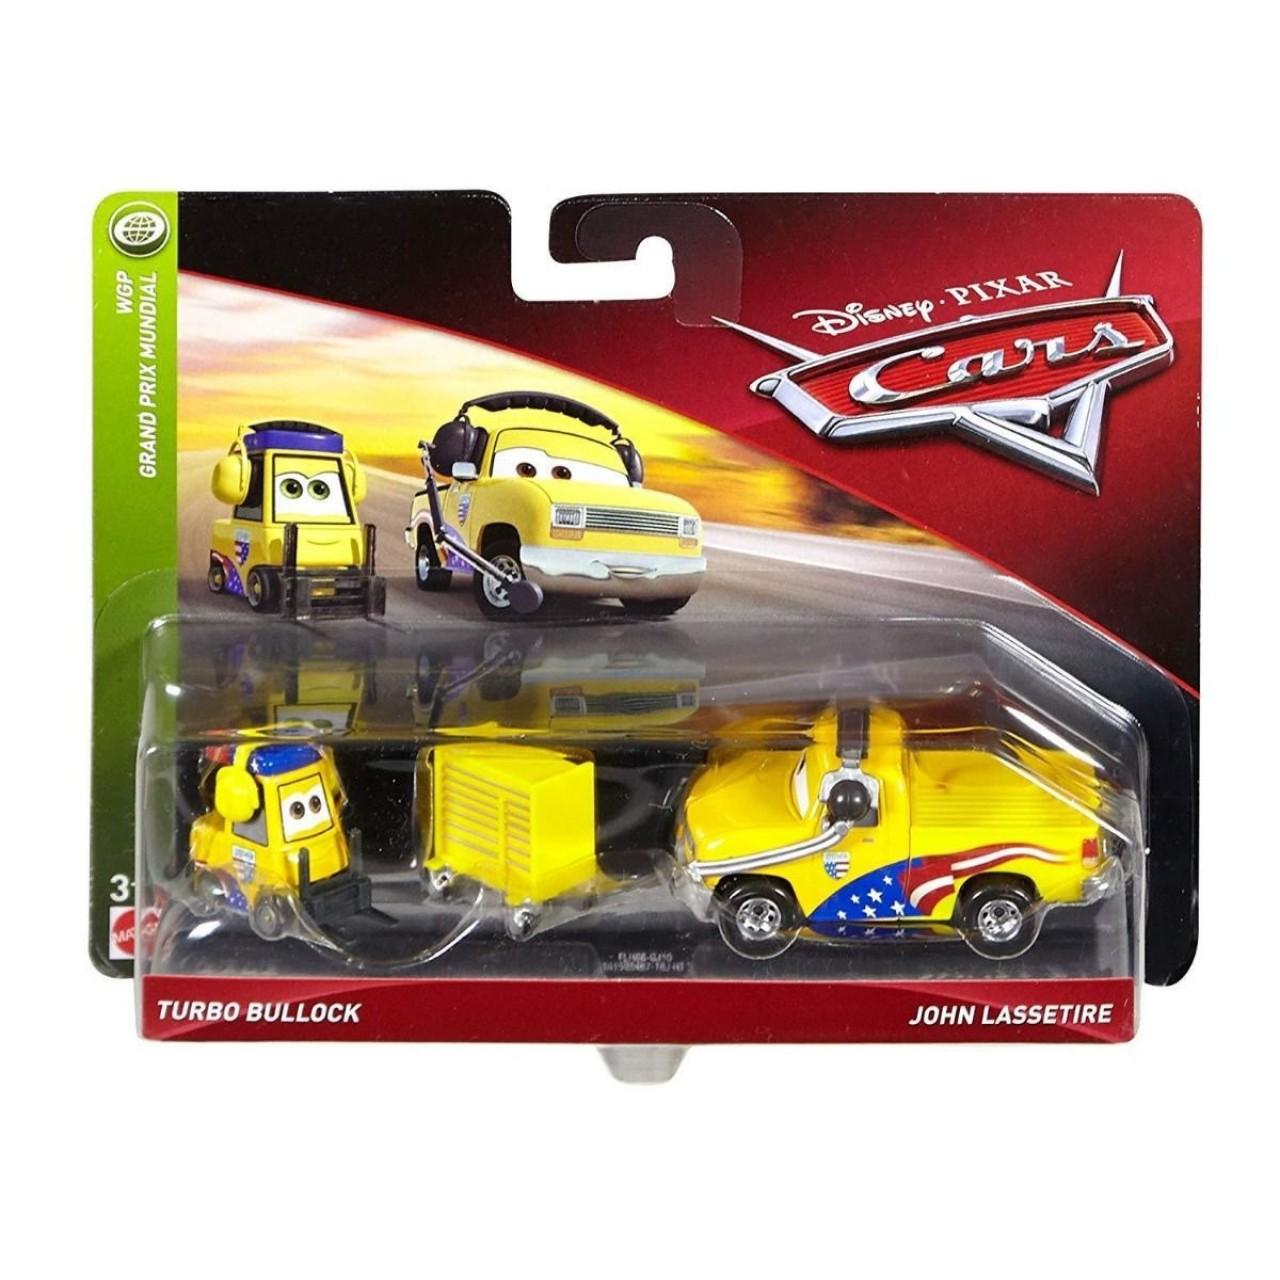 Disney/Pixar Тачки 3: Шеф Джон Ласcетир и Турбо Буллок FLH66 (Cars 3 Turbo Bullock & John Lassetire) от Mattel